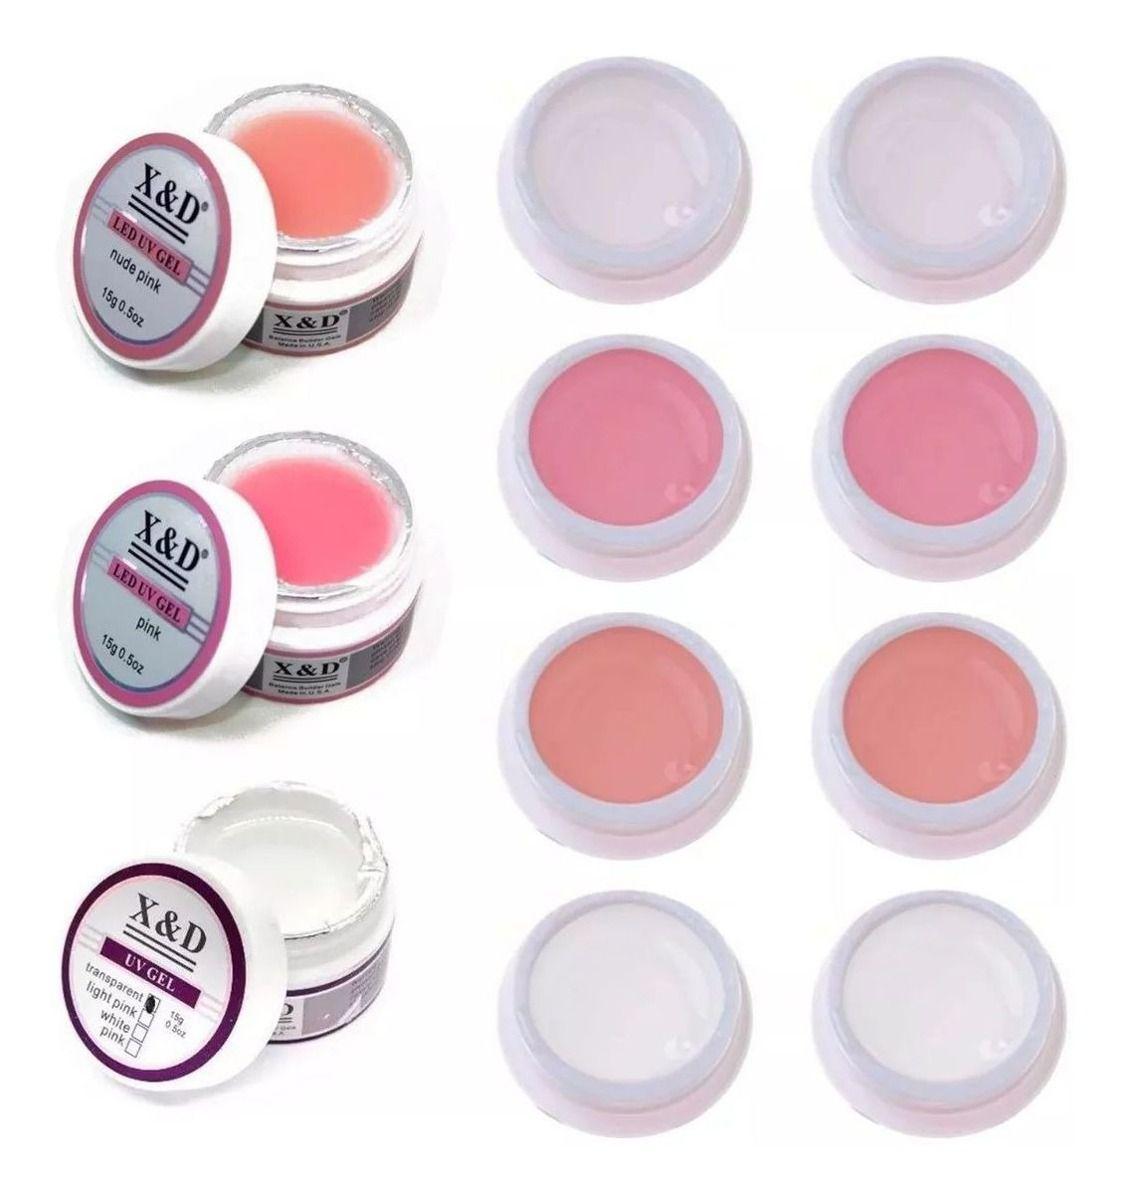 Gel Led UV  X&D 15g acrigel  nude Pink